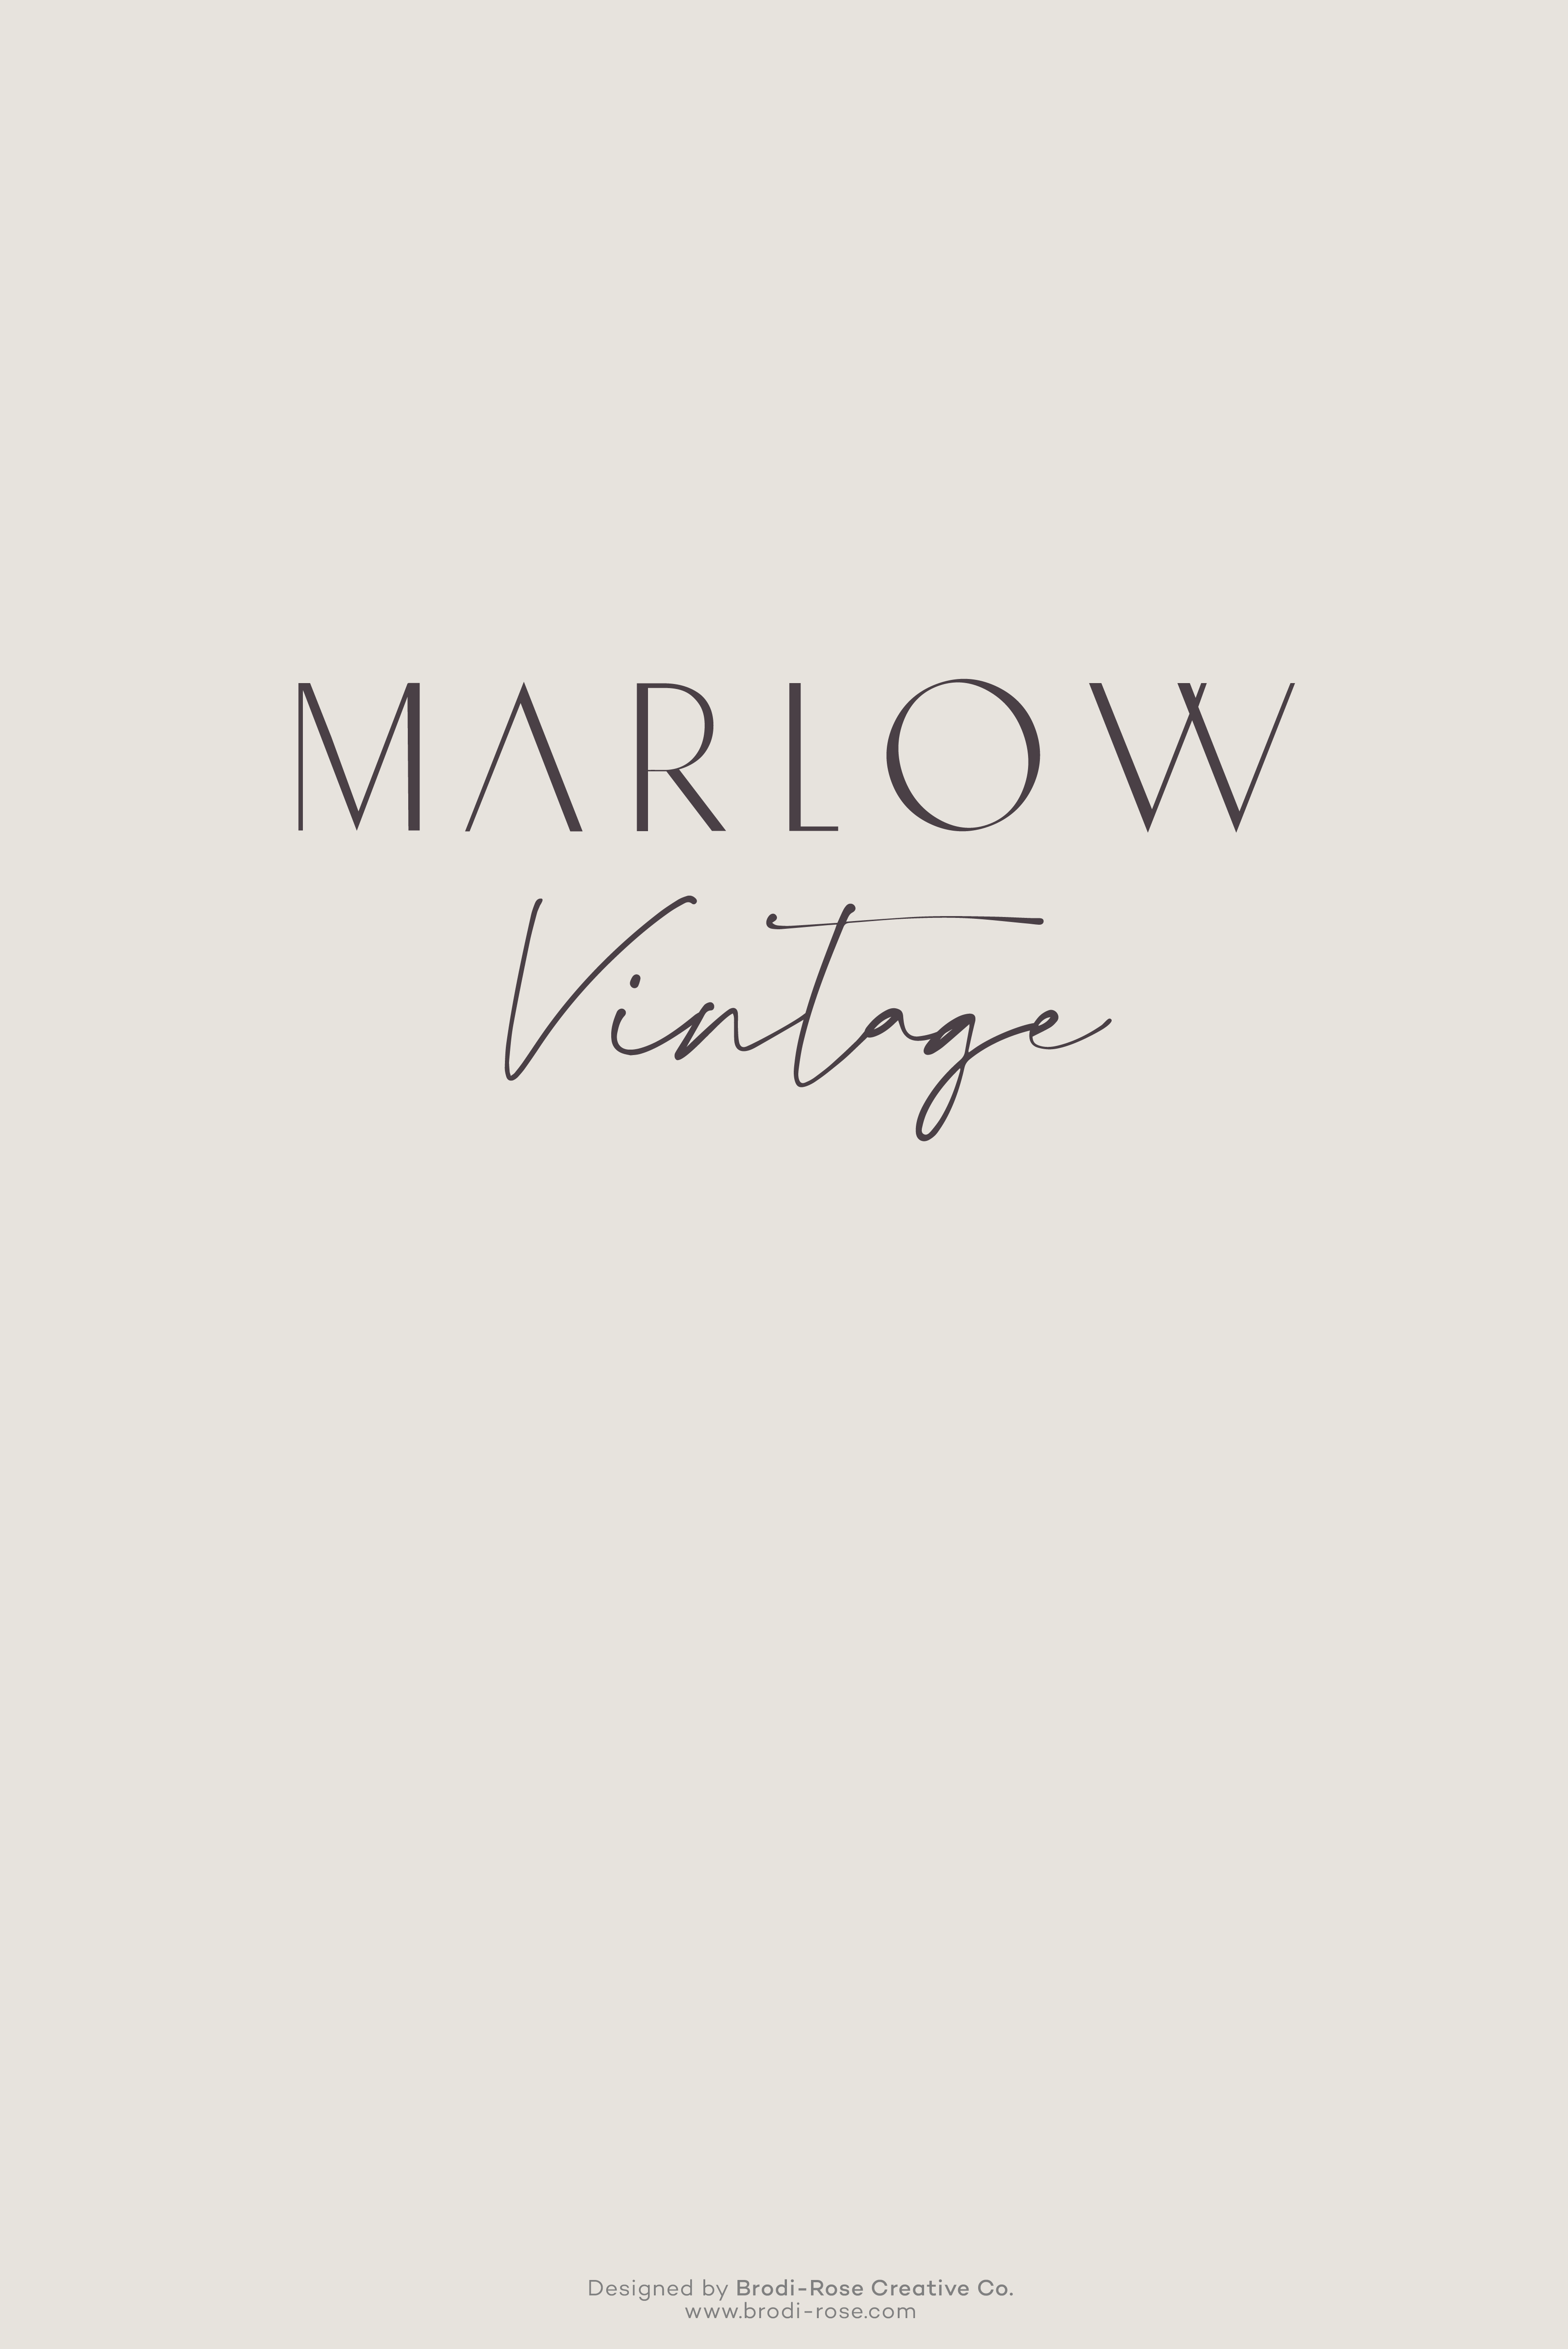 Marlow Vintage Brand Design In 2020 Branding Design Logo Branding Identity Nc Logo